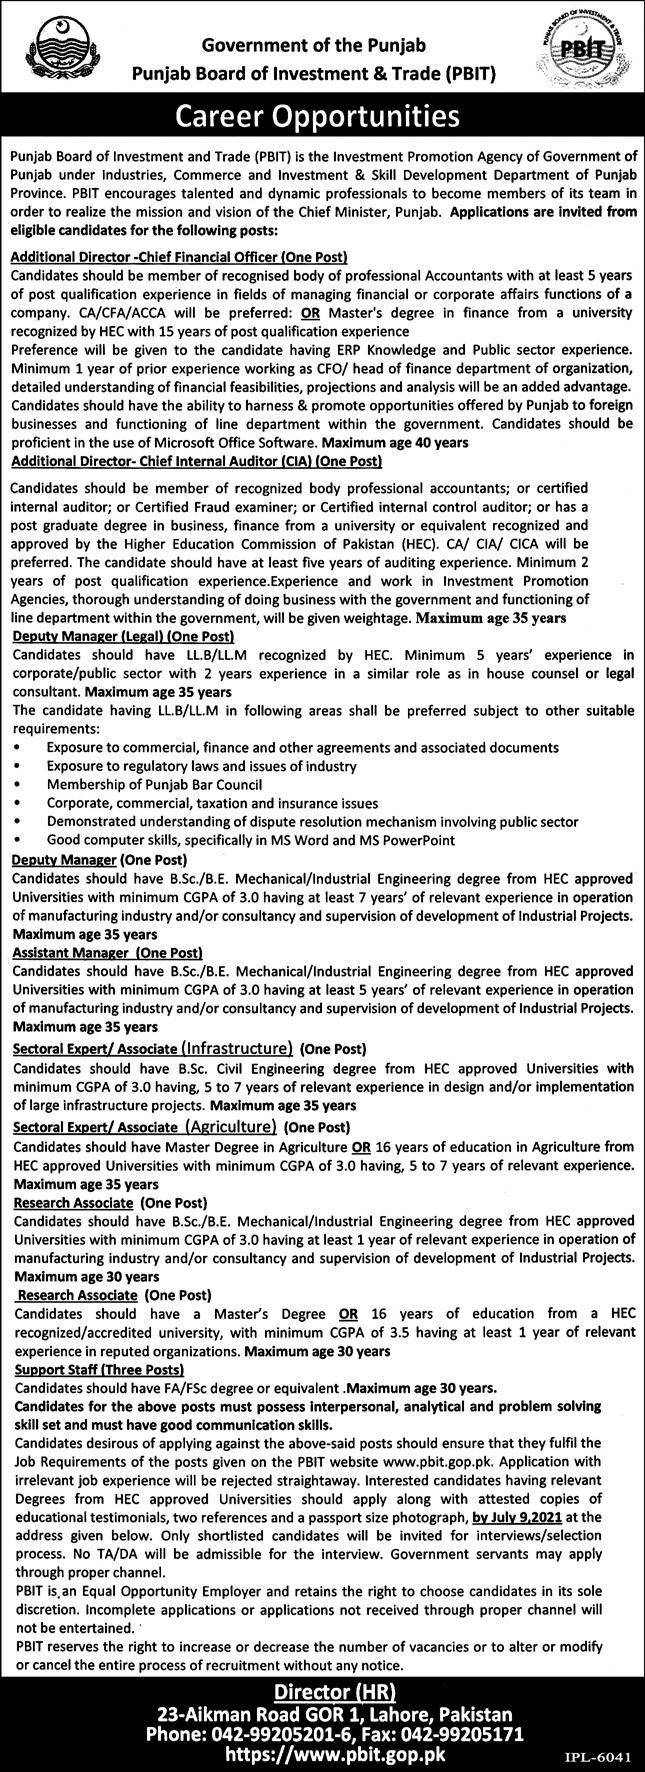 Punjab Board of Investment & Trade PBIT Jobs 2021